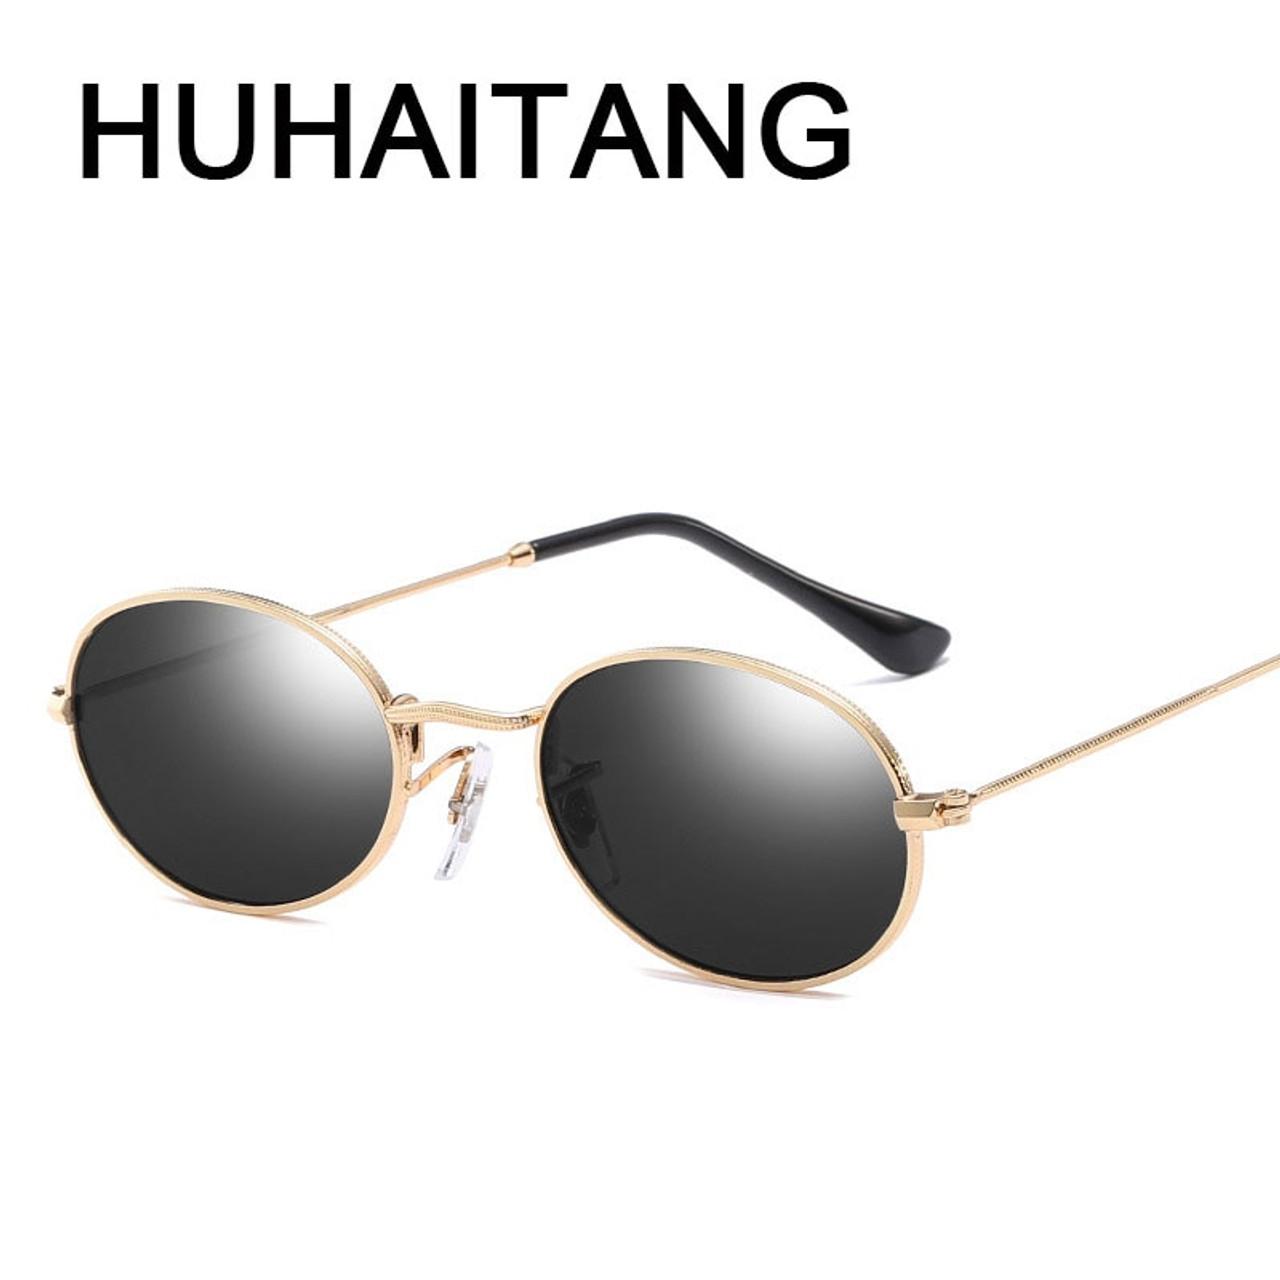 a3f4deb0a9 ... HUHAITANG classic steampunk sunglasses women vintage punk metal small sun  glasses for men 2019 high quality ...